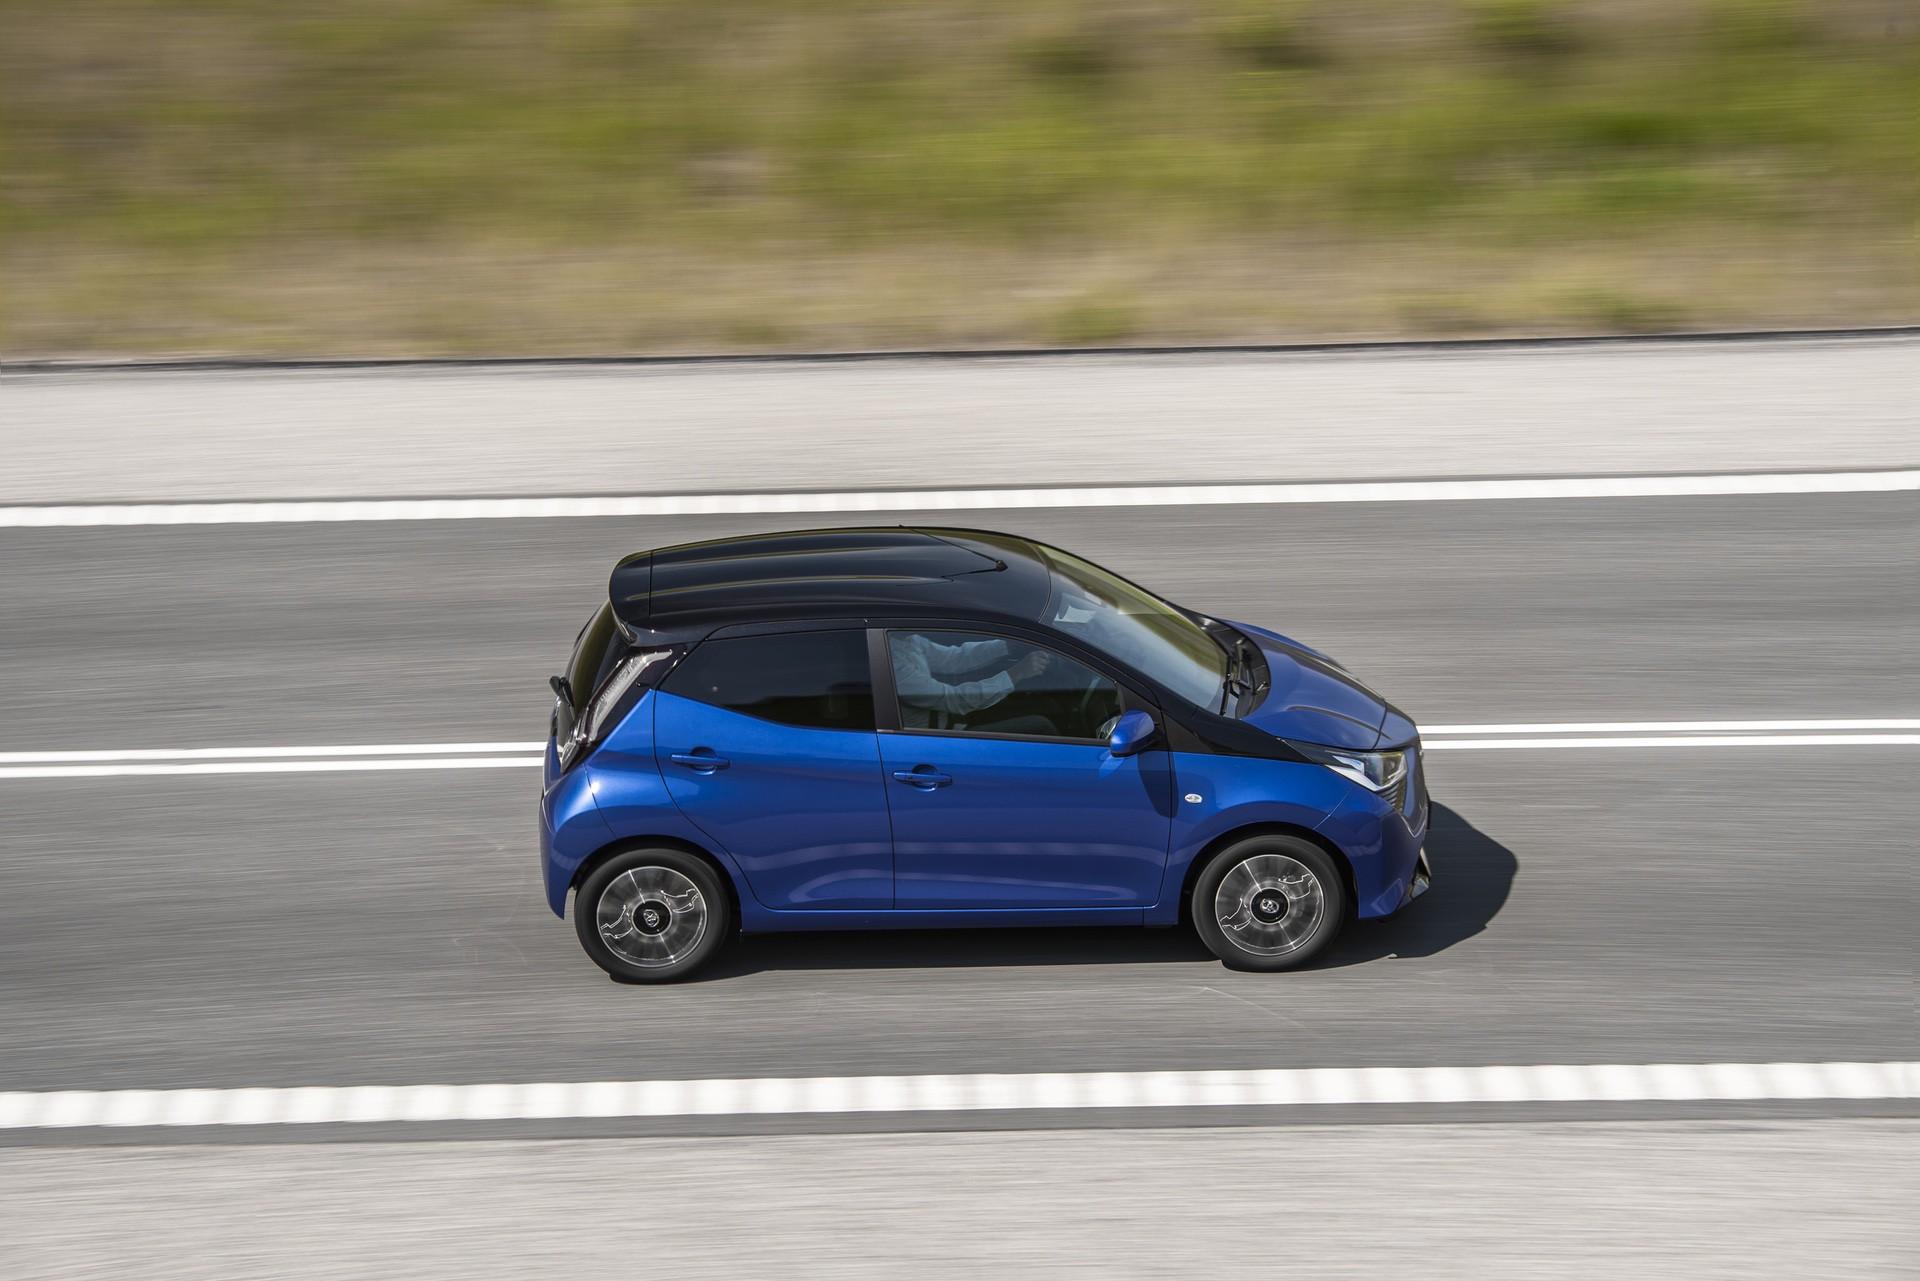 Toyota_Aygo_facelift_presskit_0012